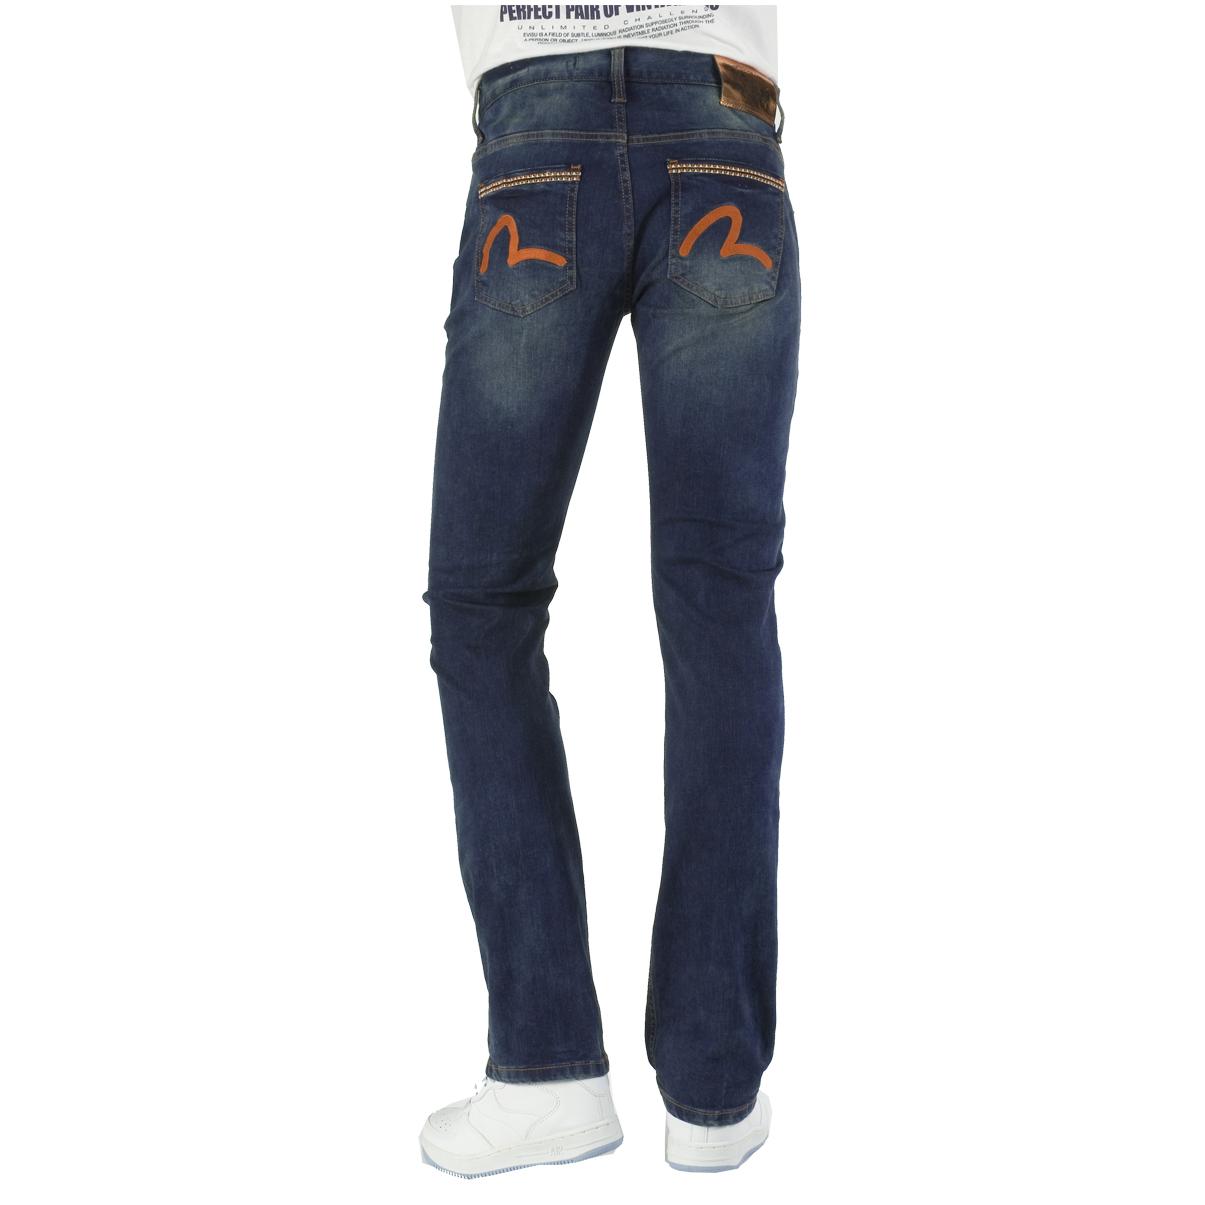 EL9JP003_直筒牛仔裤裤